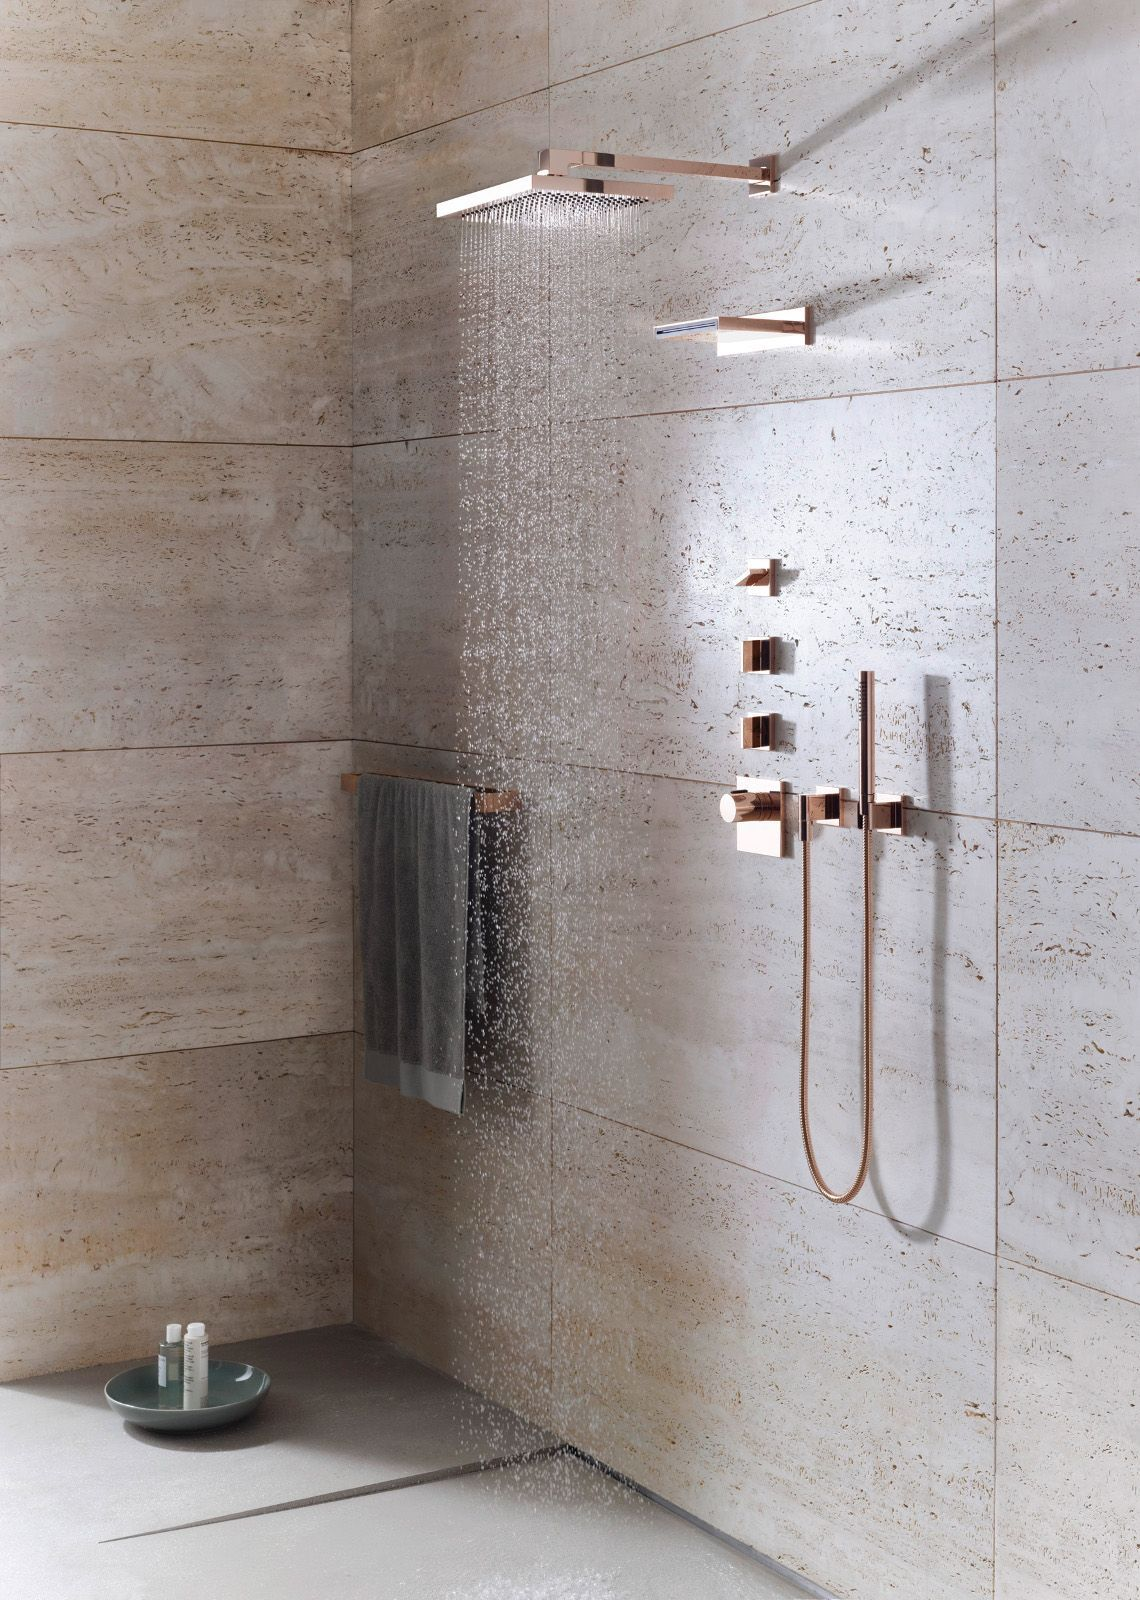 Rosegold Fixtures Love The Rose Gold Fixtures Especially The Shower Head Dornbracht Mem Series Bathroom Trends Bathroom Design Shower Fixtures